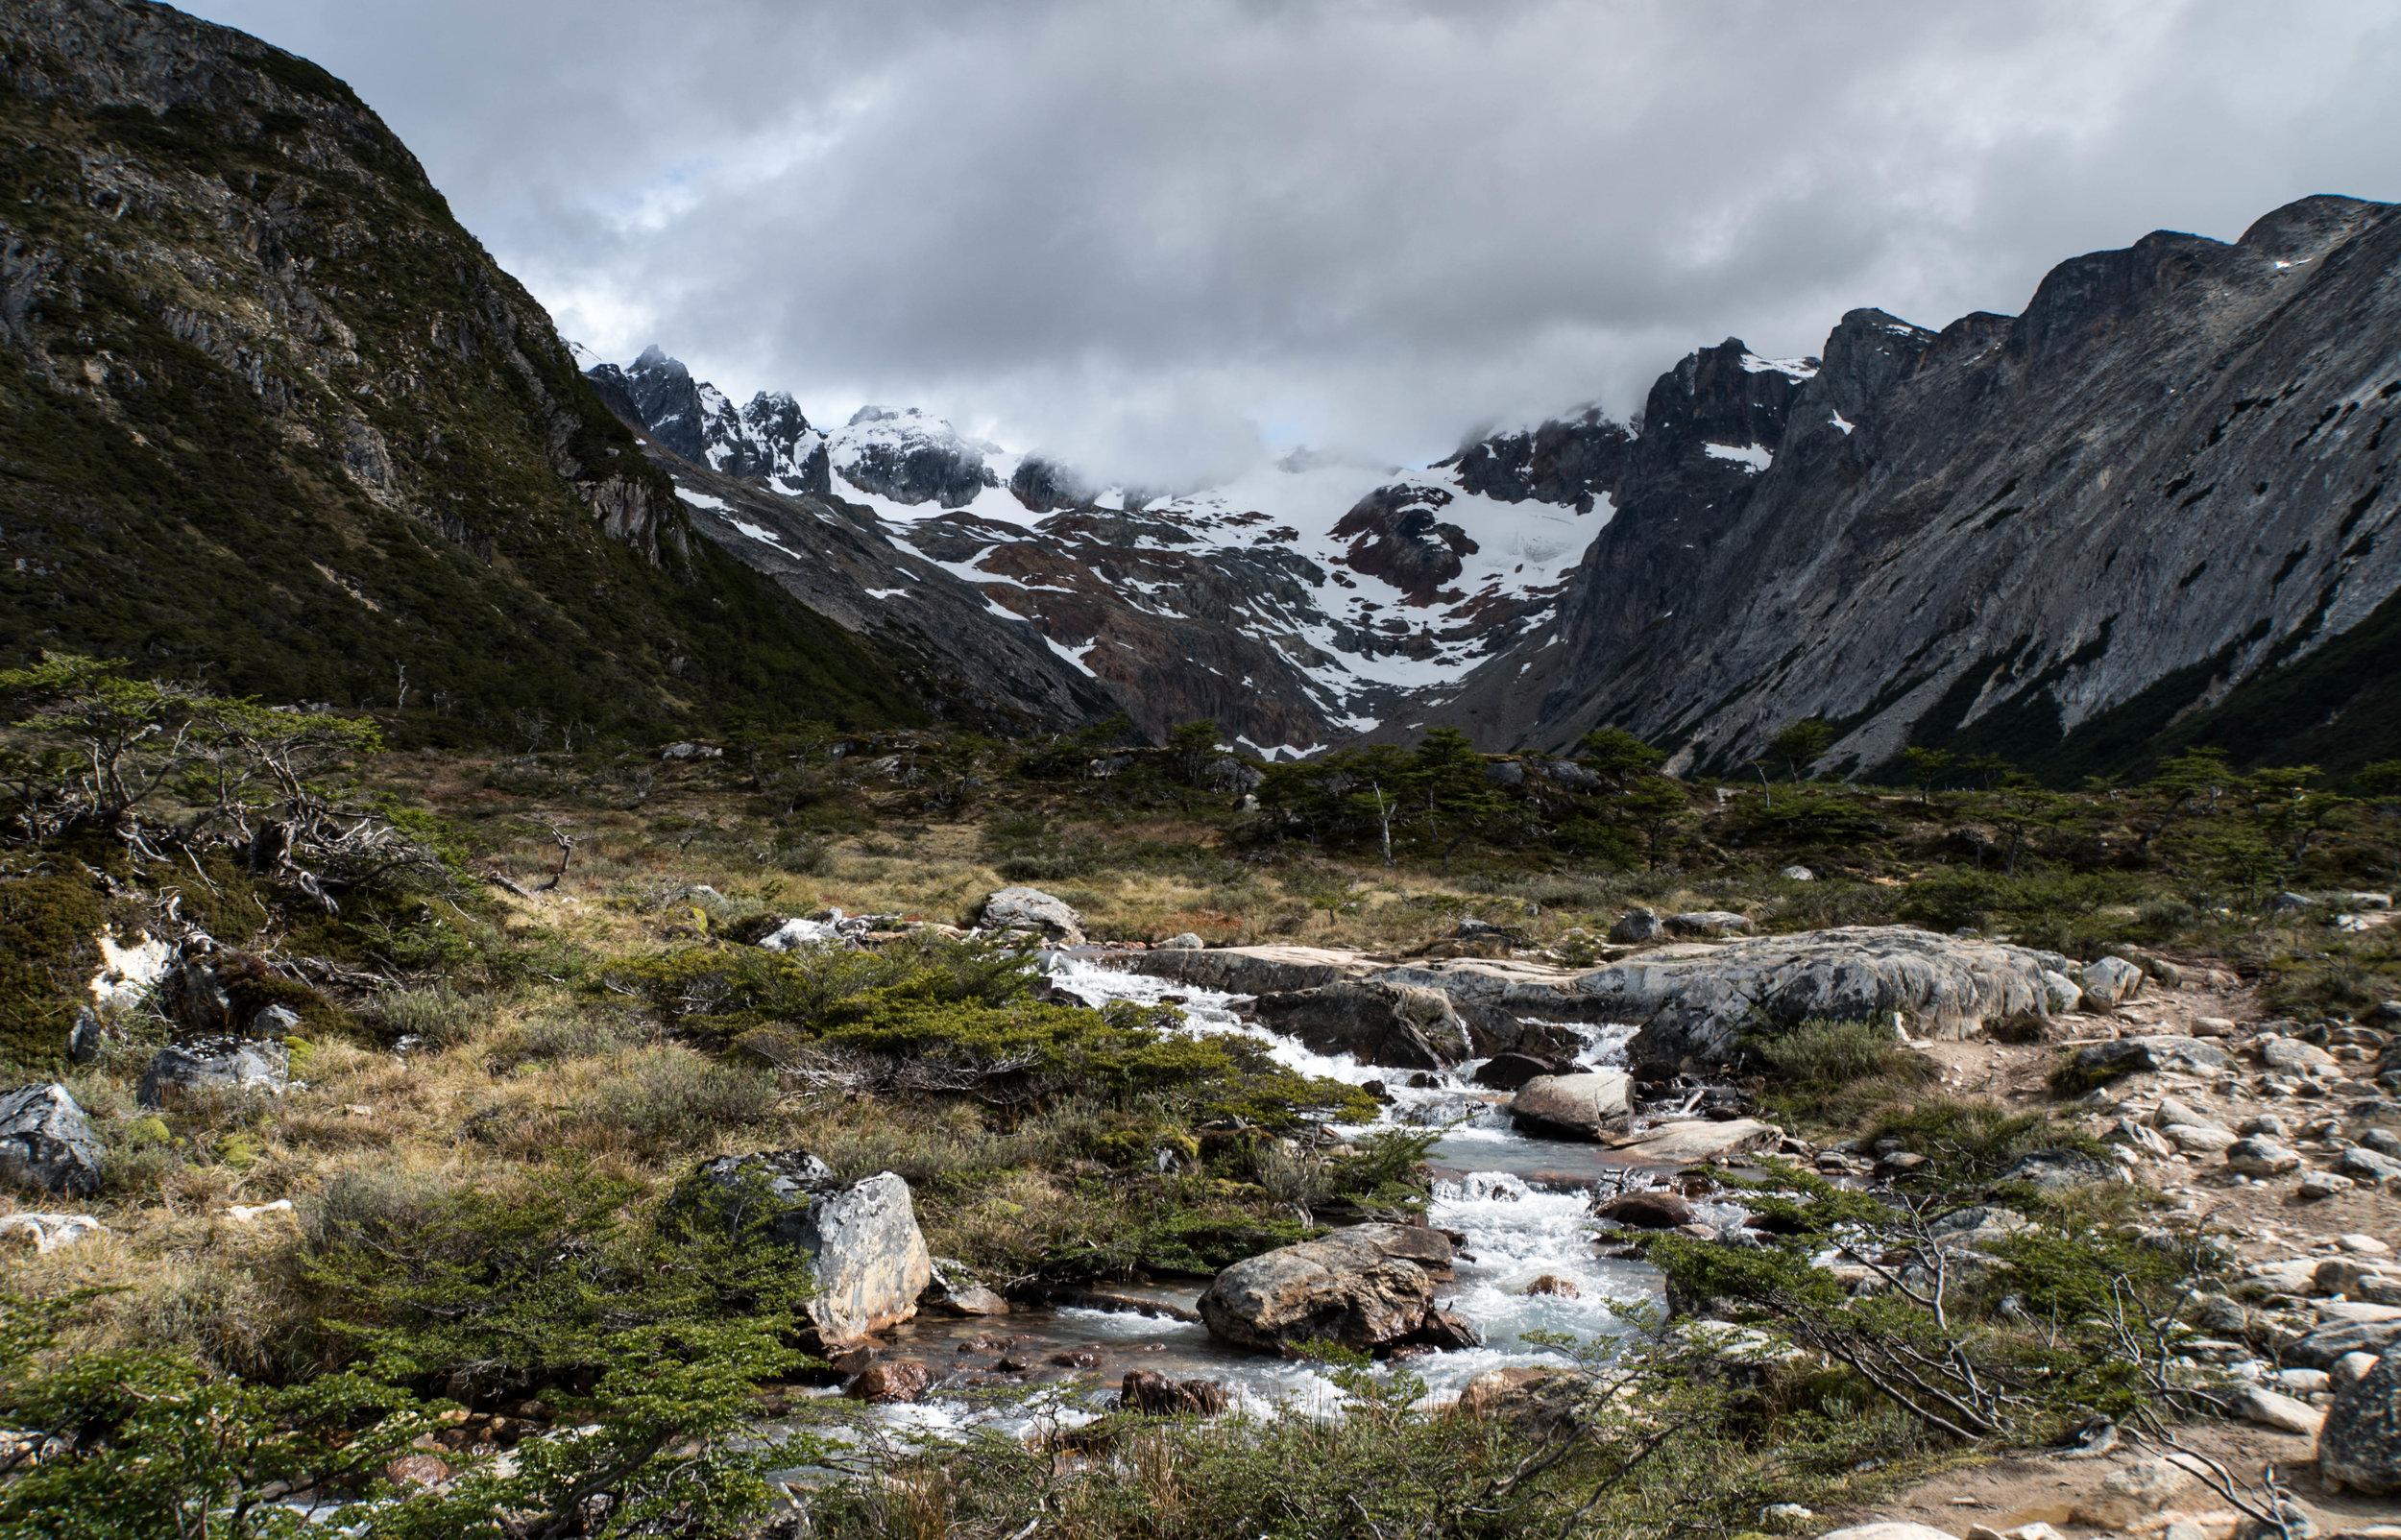 Peat bogs surrounding the drainage of Laguna Esmerelda. Ushuaia, Argentina.